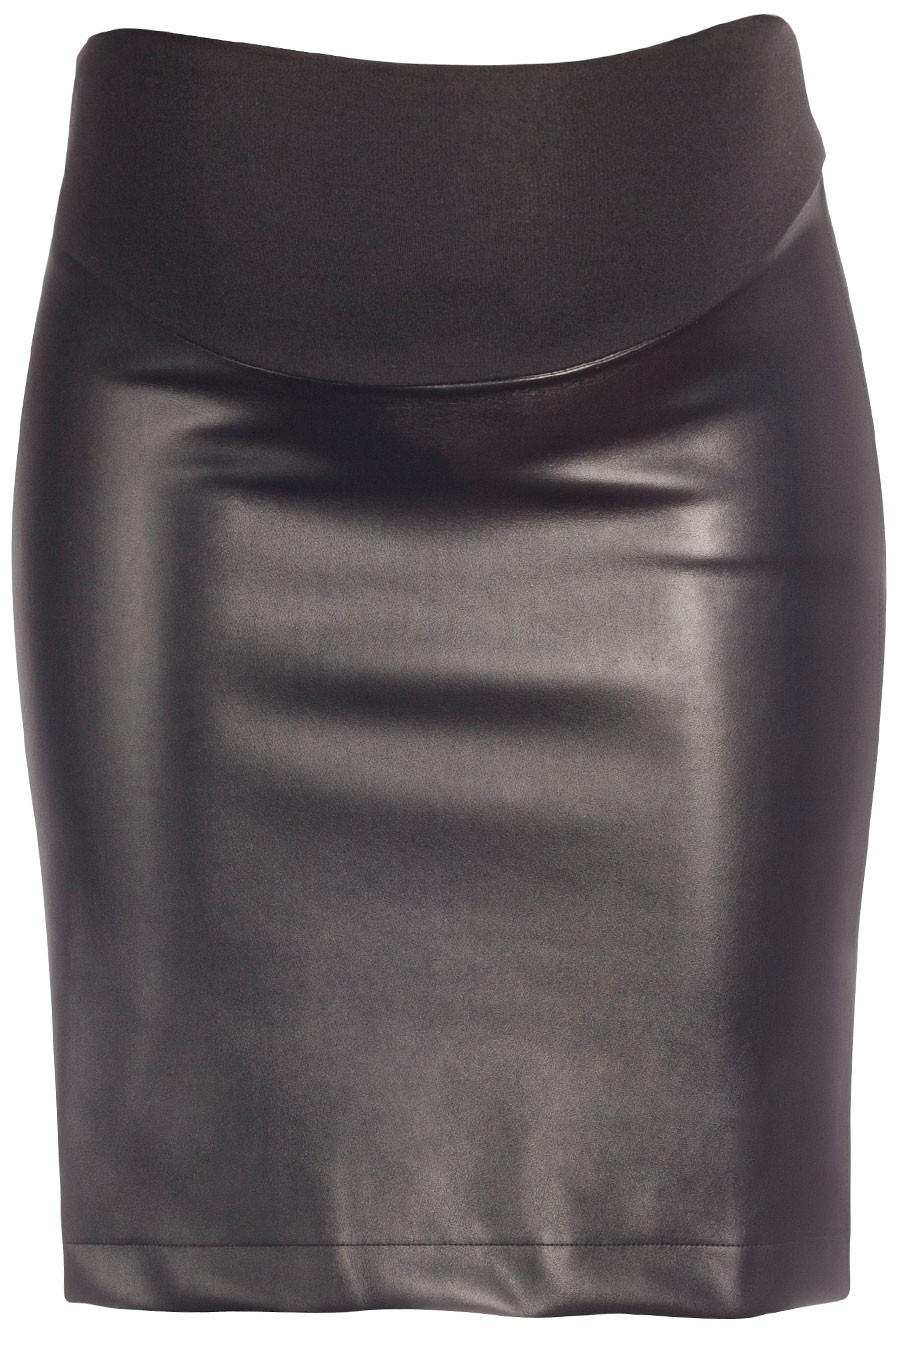 ST. MORITZ Faux Leather Mini Skirt